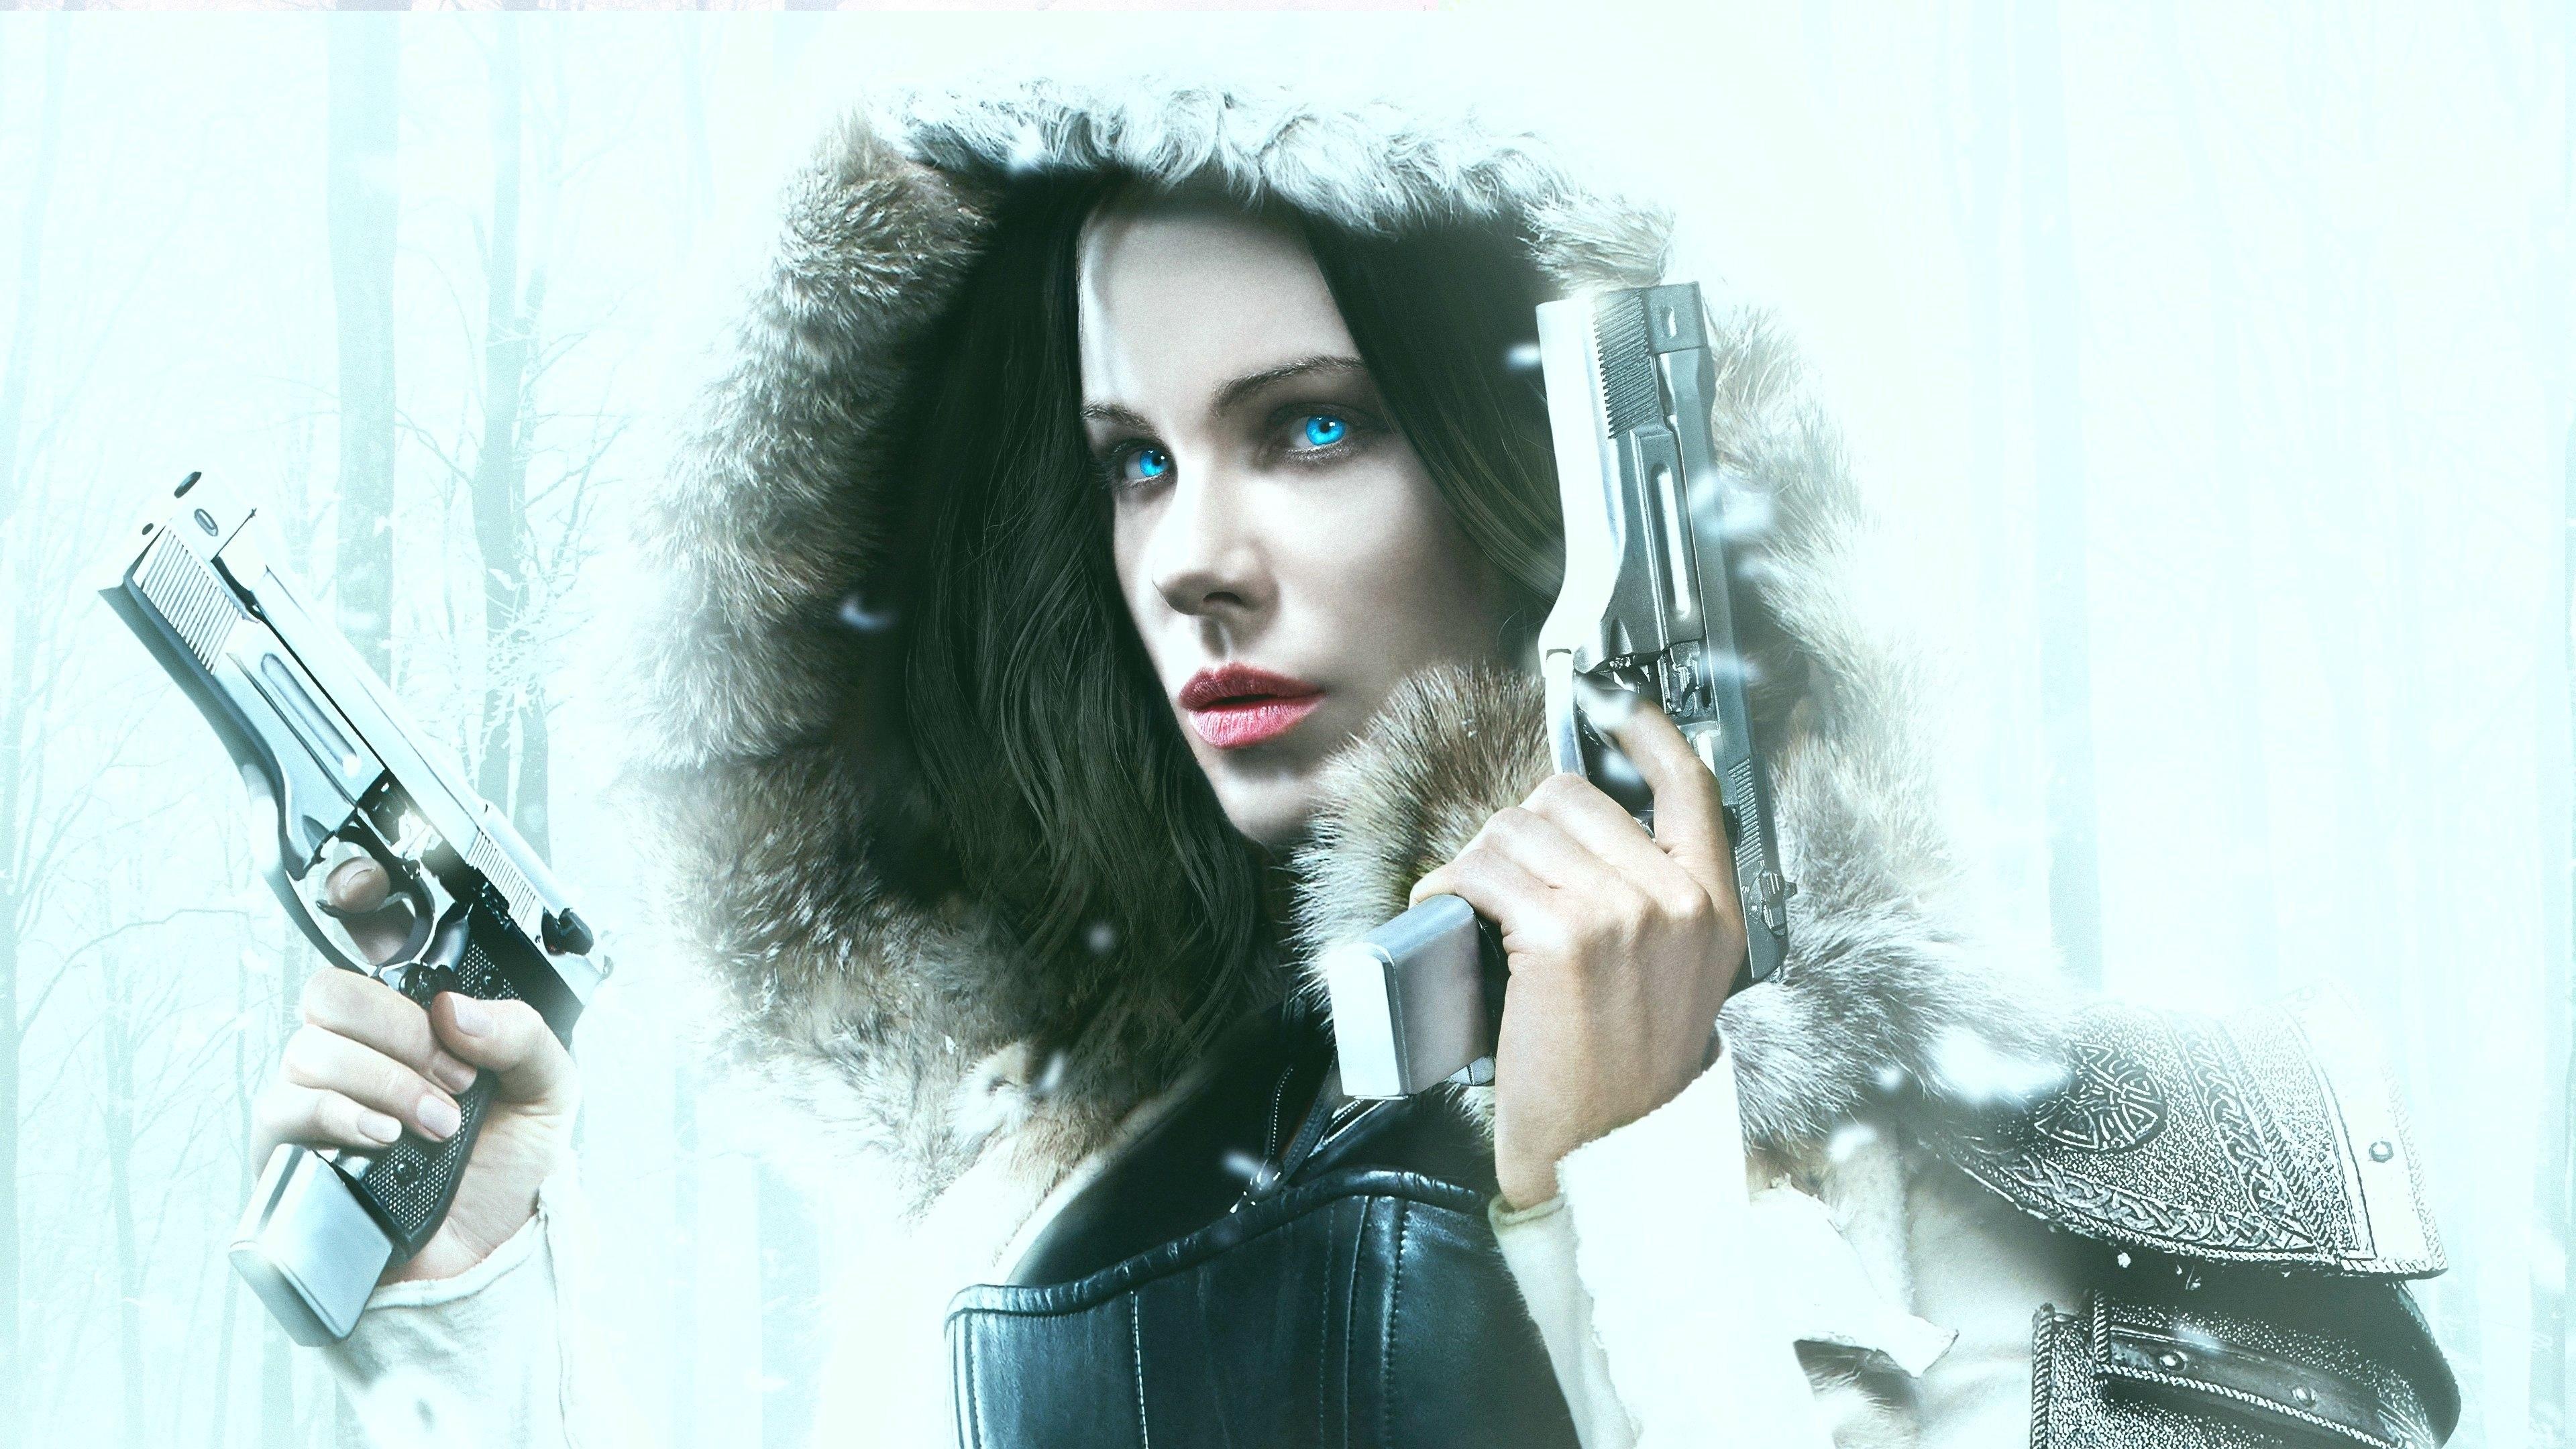 Wallpaper Underworld Blood Wars 2016 Kate Beckinsale 3840x2160 Uhd 4k Picture Image